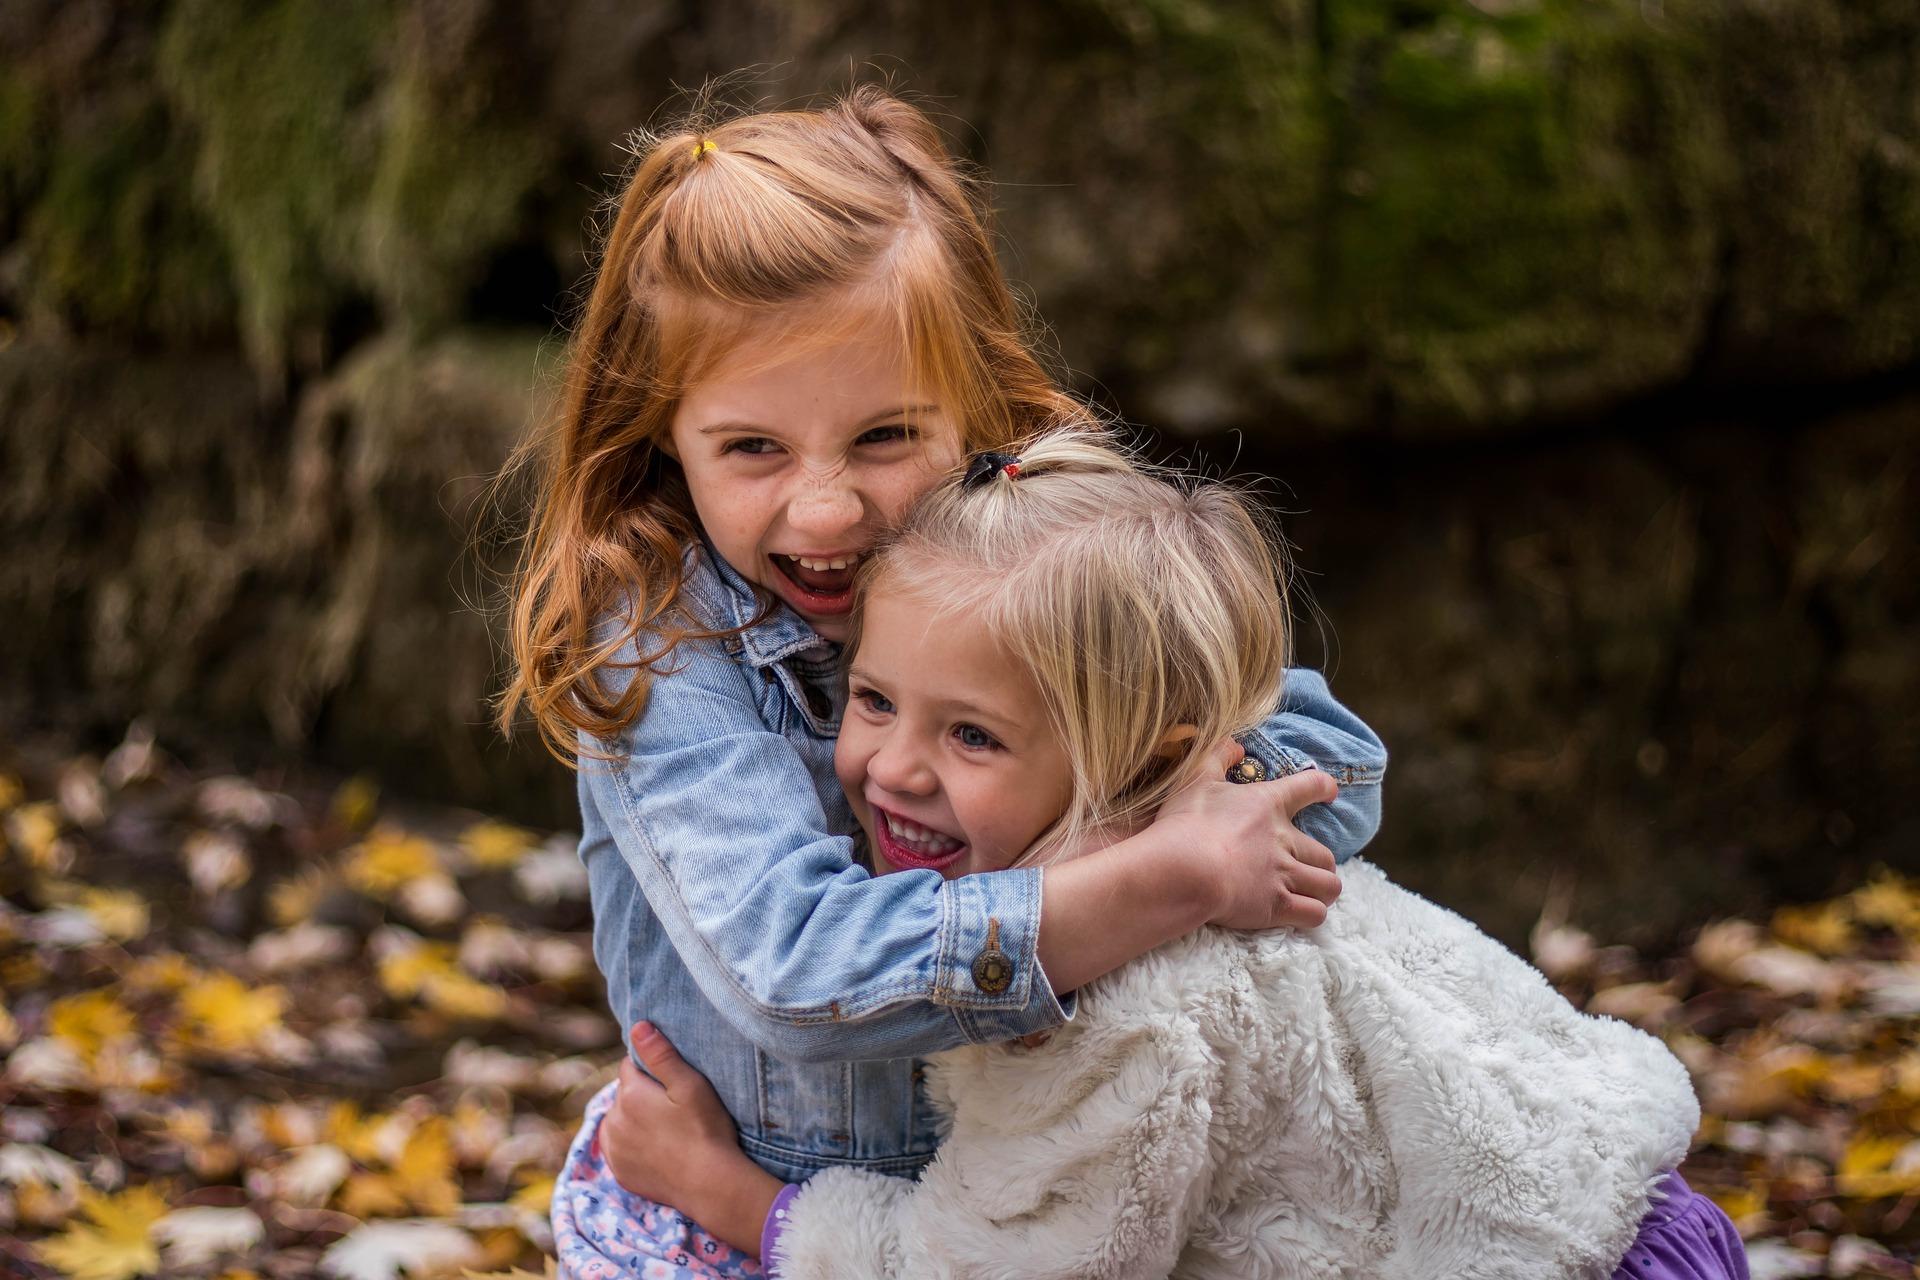 Emotional Education for Children